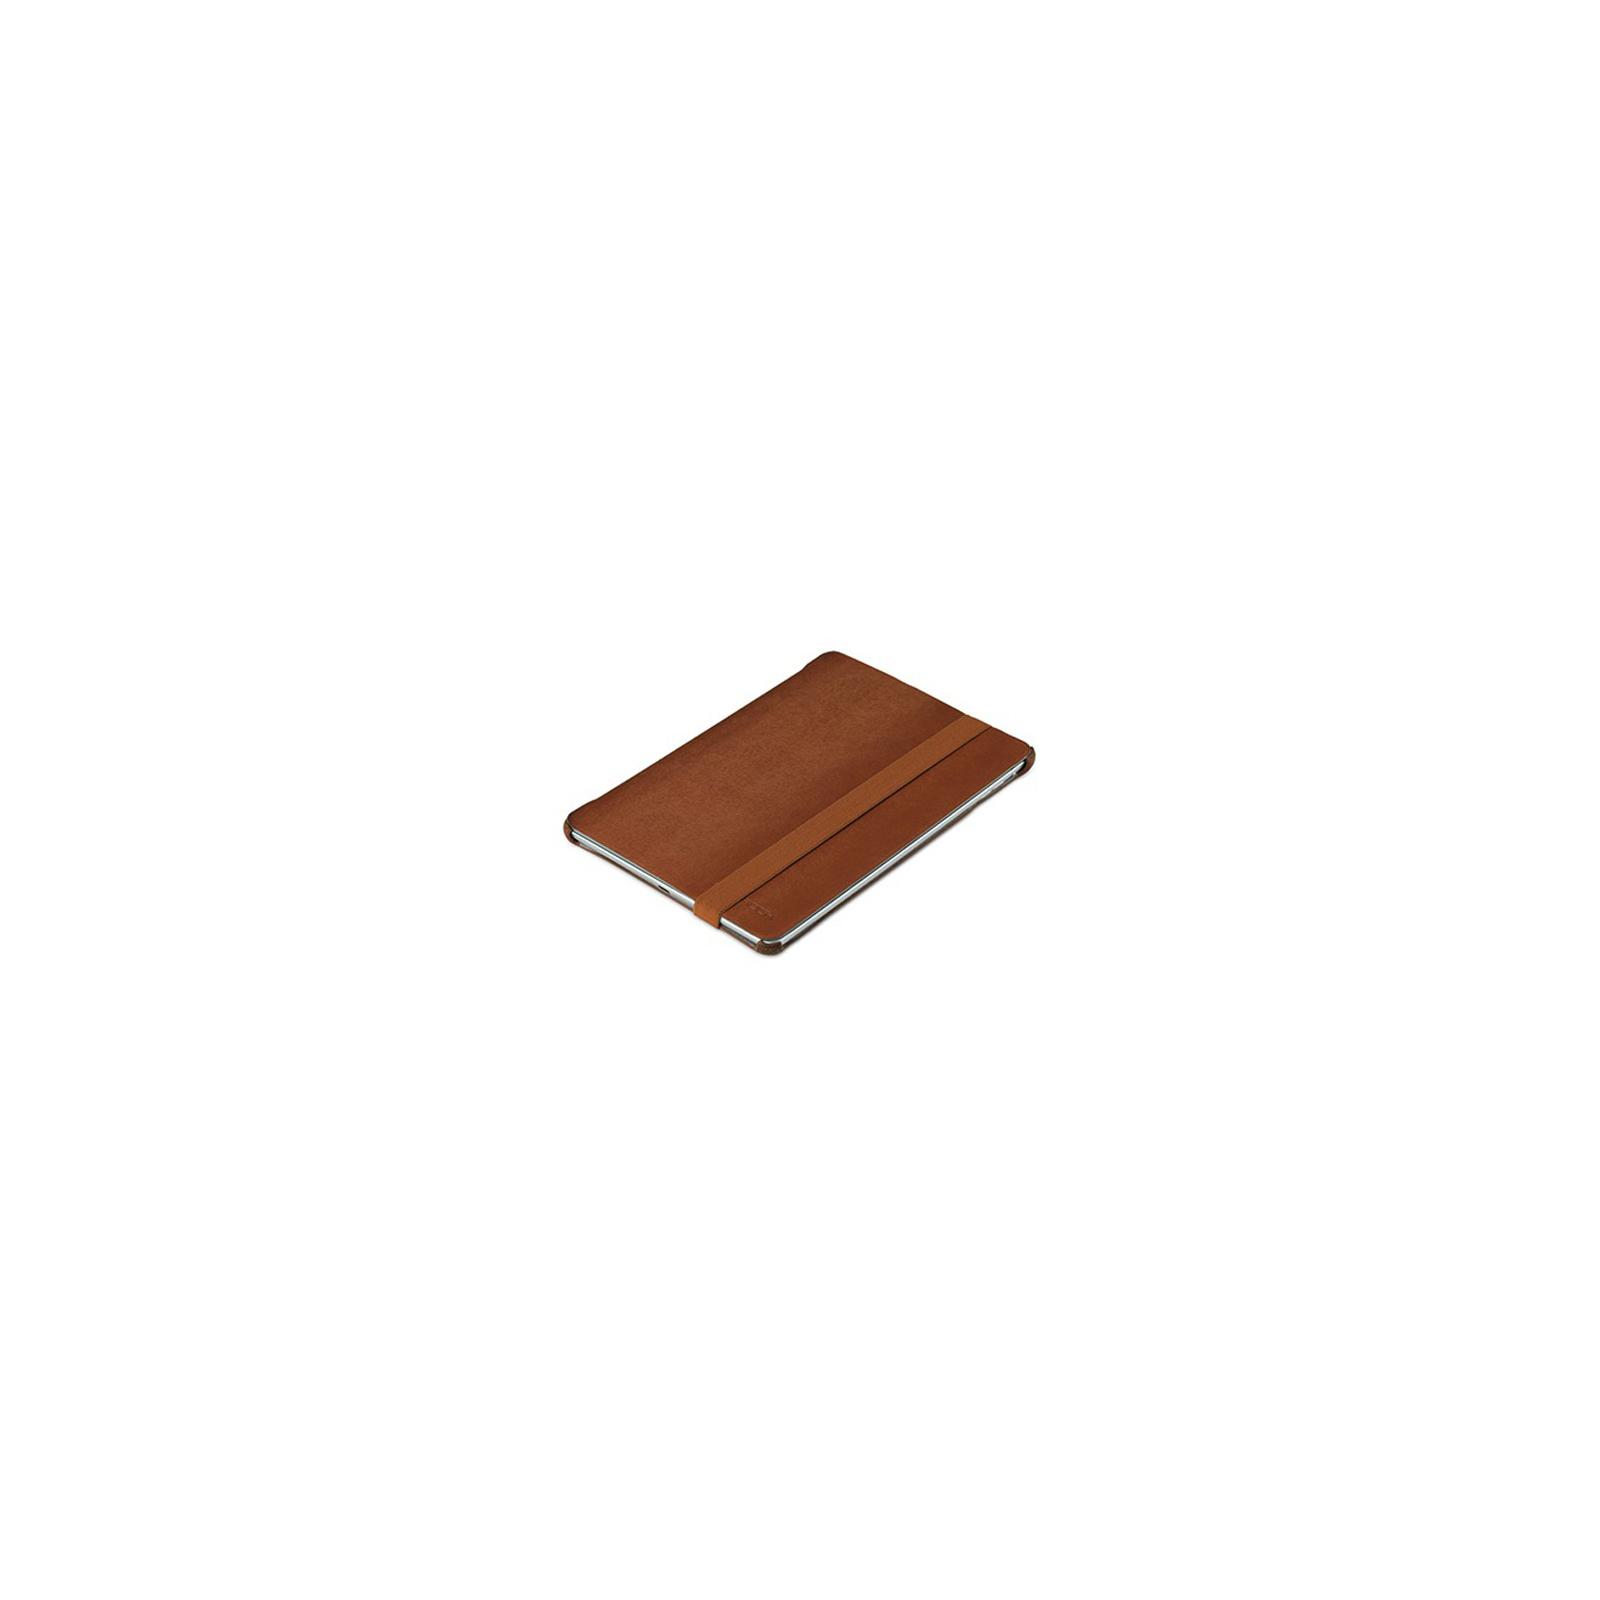 Чехол для планшета Rock texture series iPad Air coffee (iPad Air-57481) изображение 3